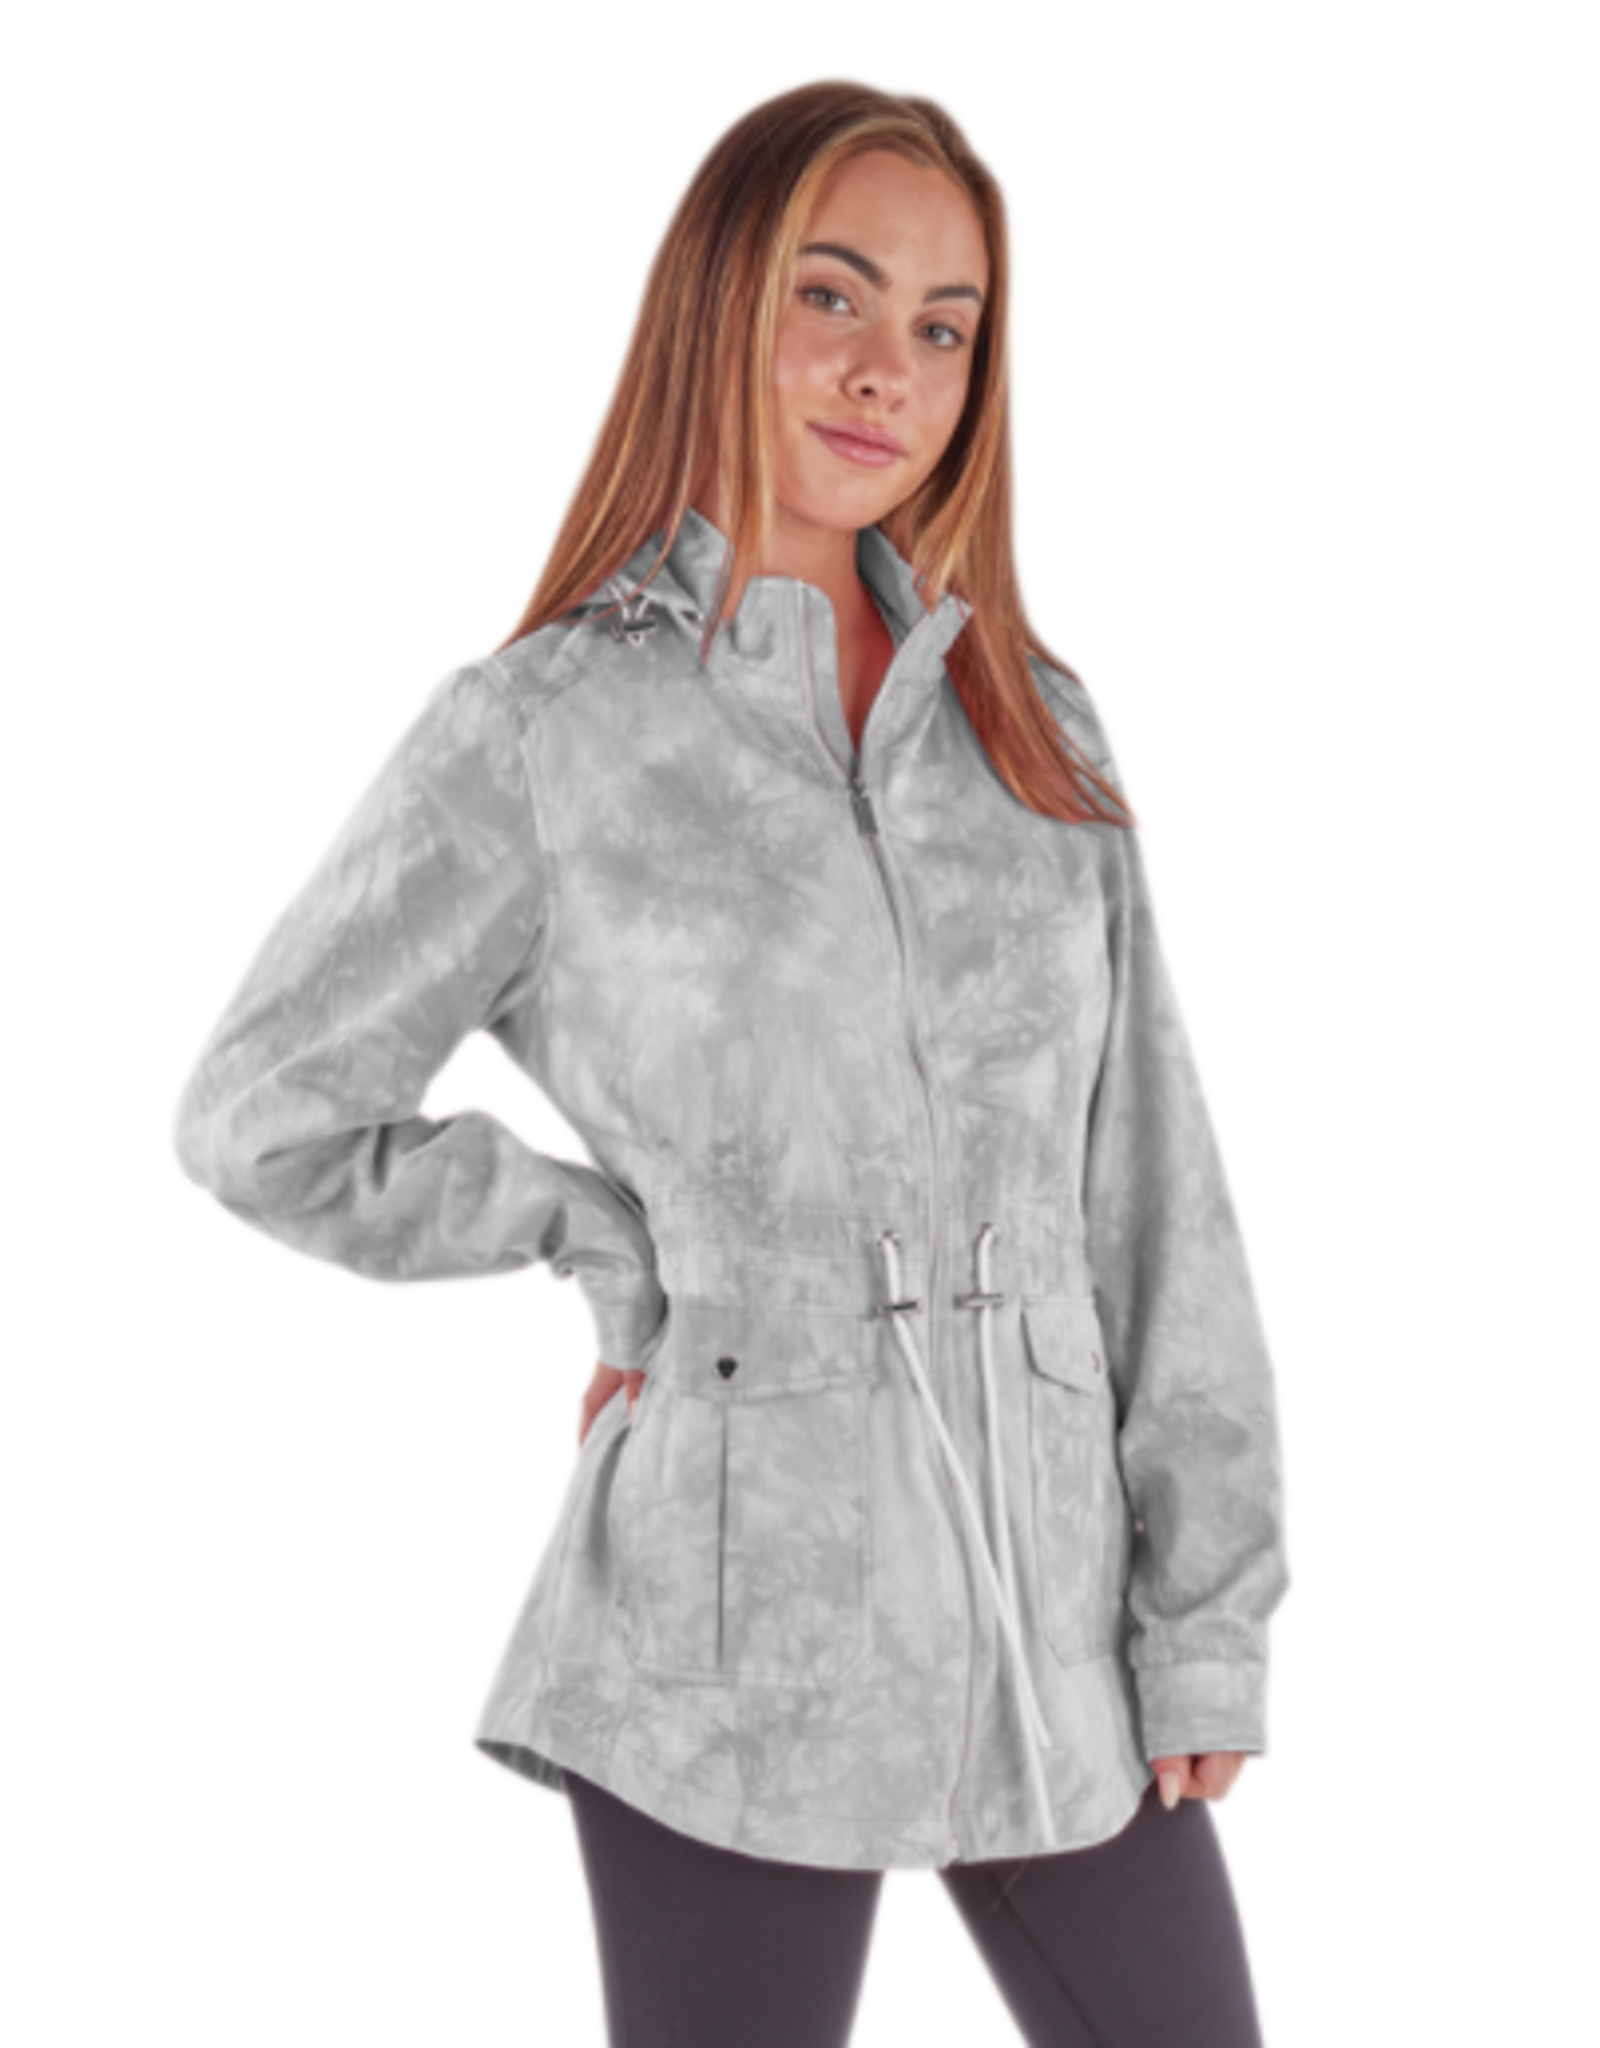 NON-UNIFORM Women's Bristol Utility Jacket, Custom Order